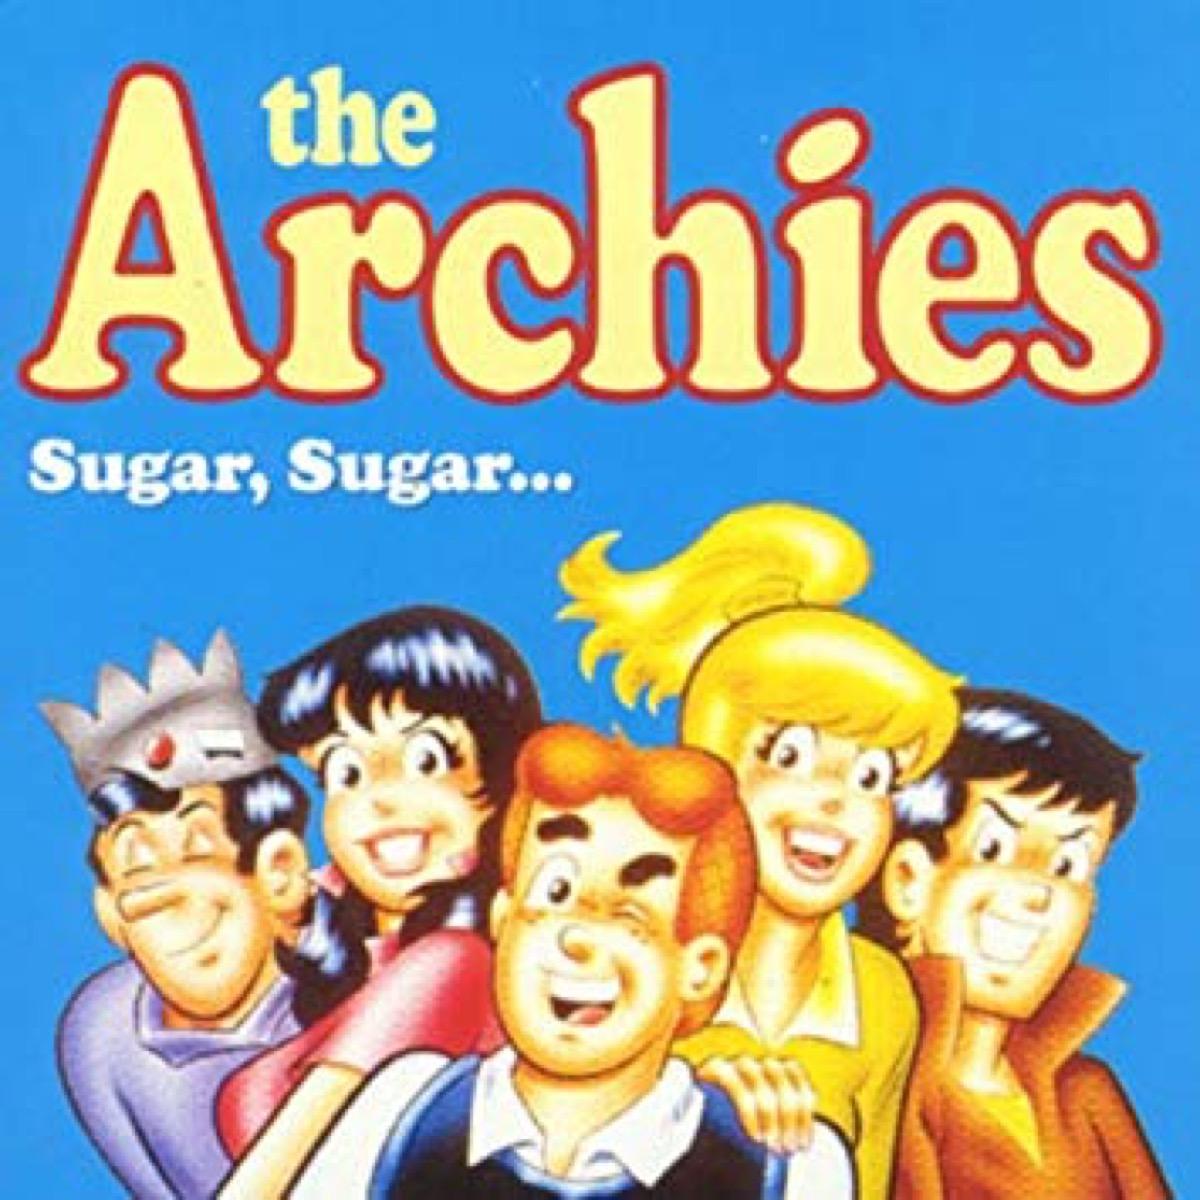 sugar sugar the archies single cover,